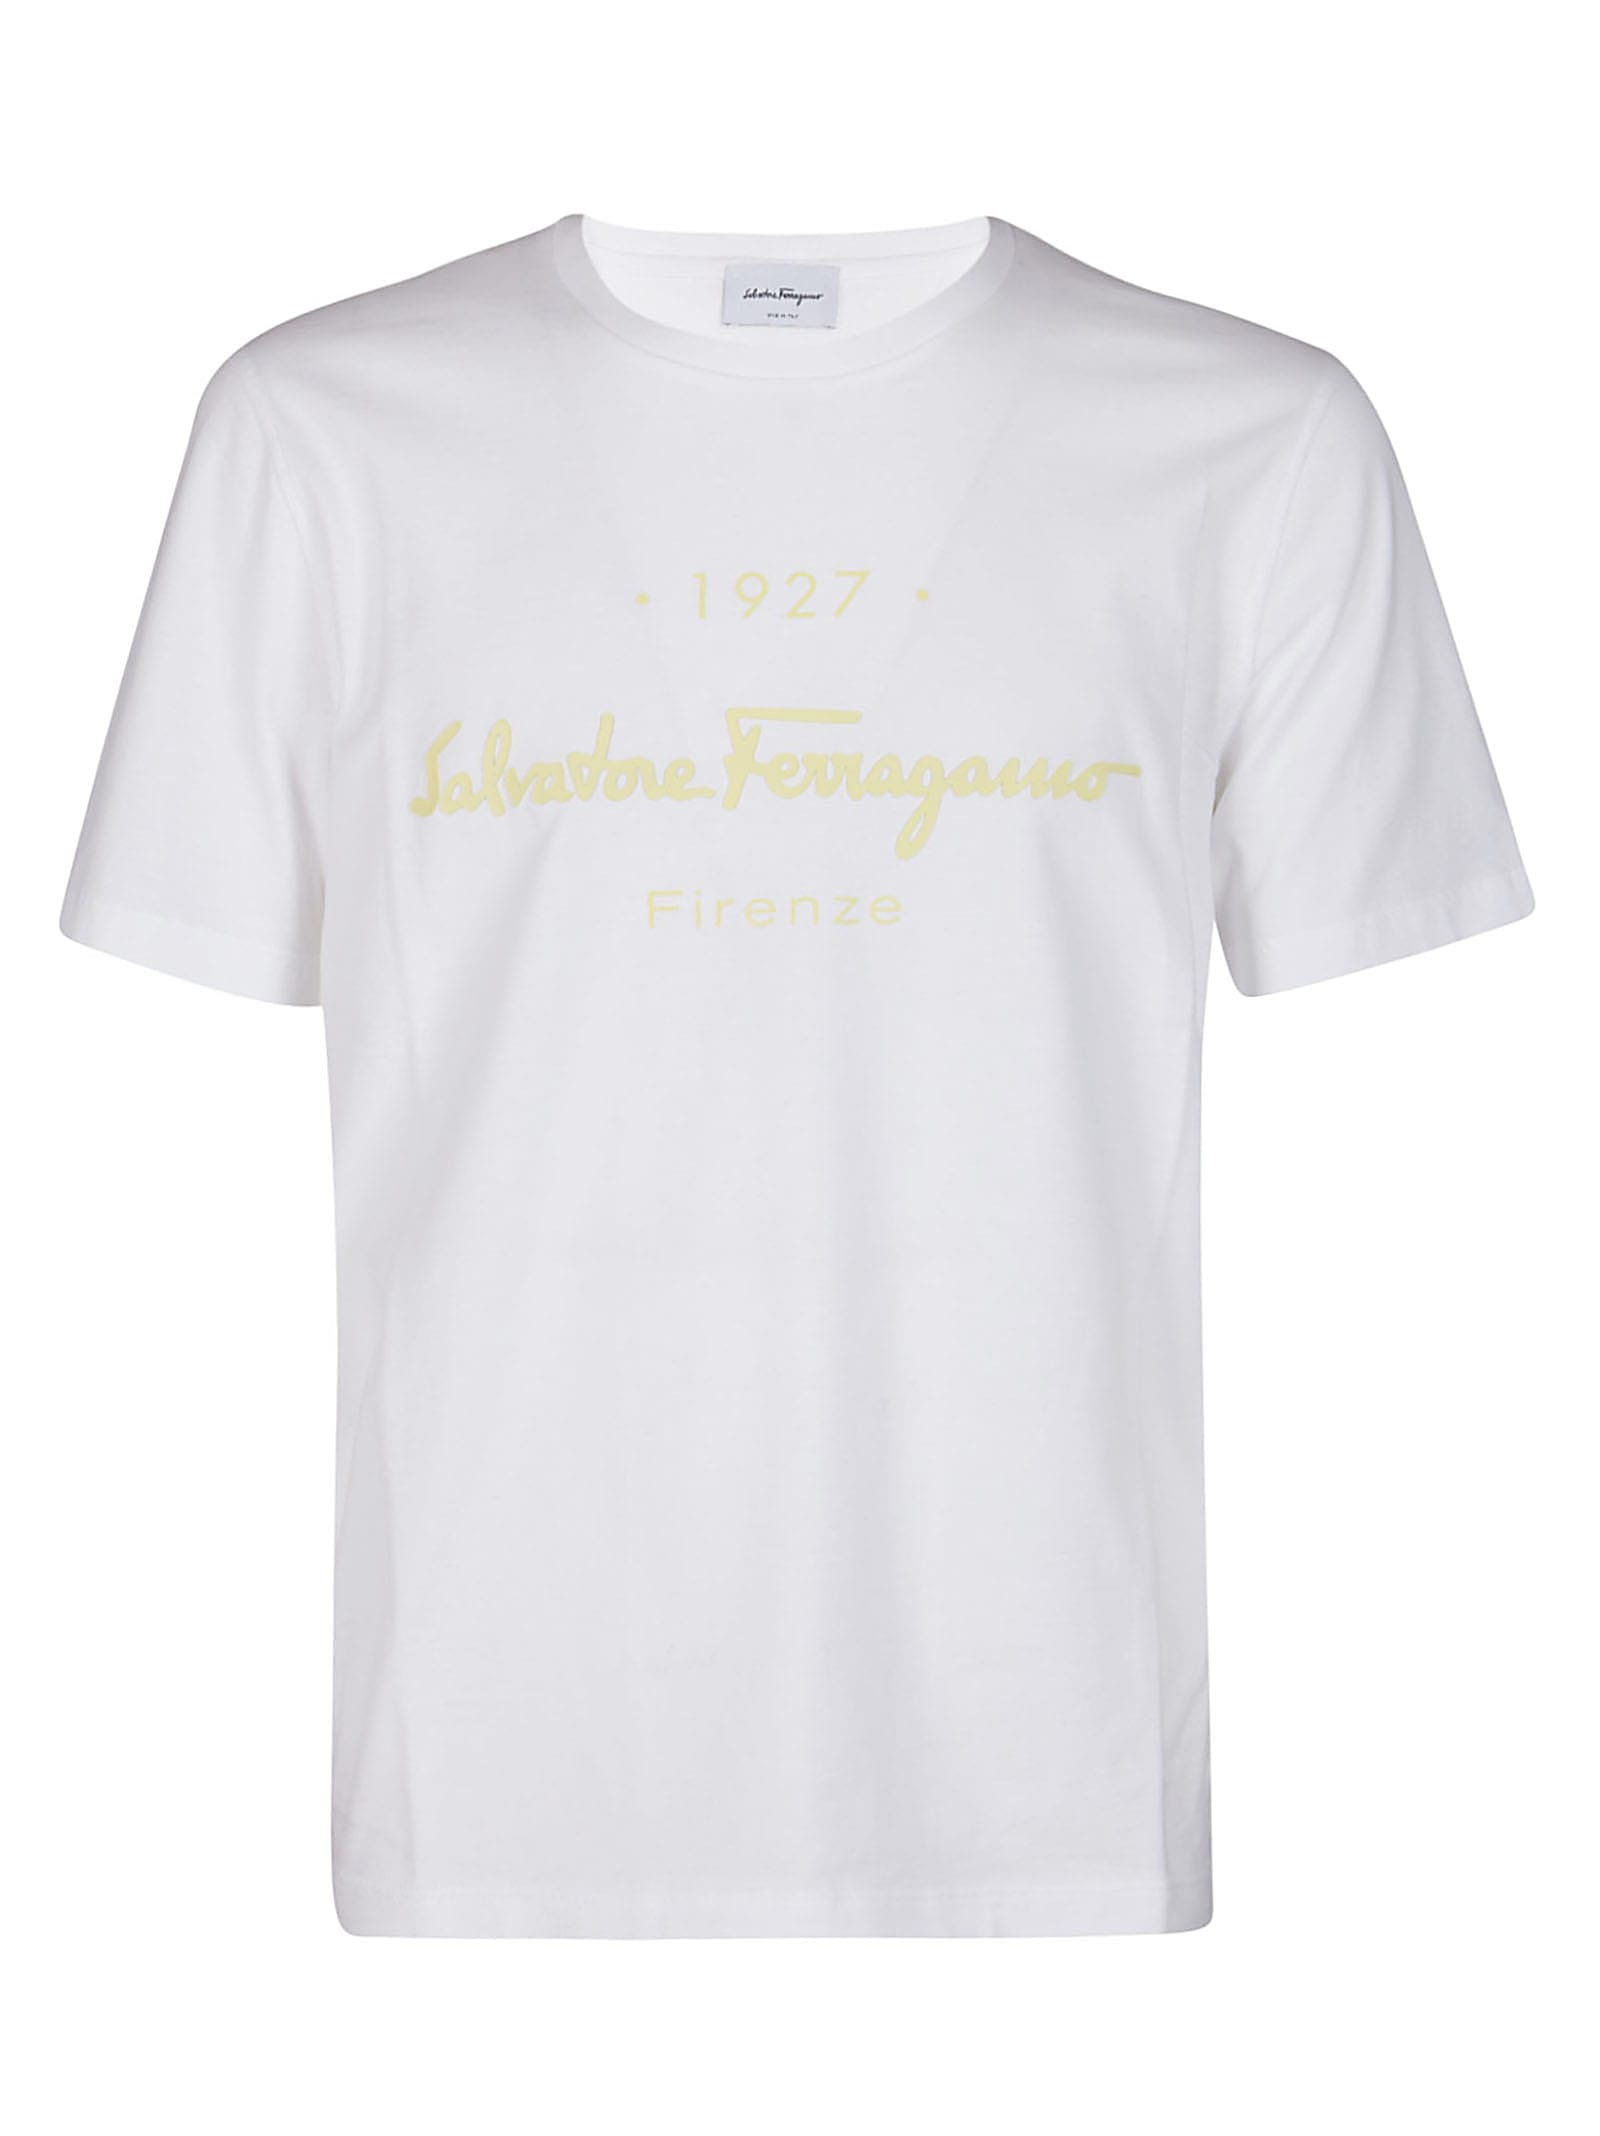 Salvatore Ferragamo Cottons WHITE COTTON T-SHIRT